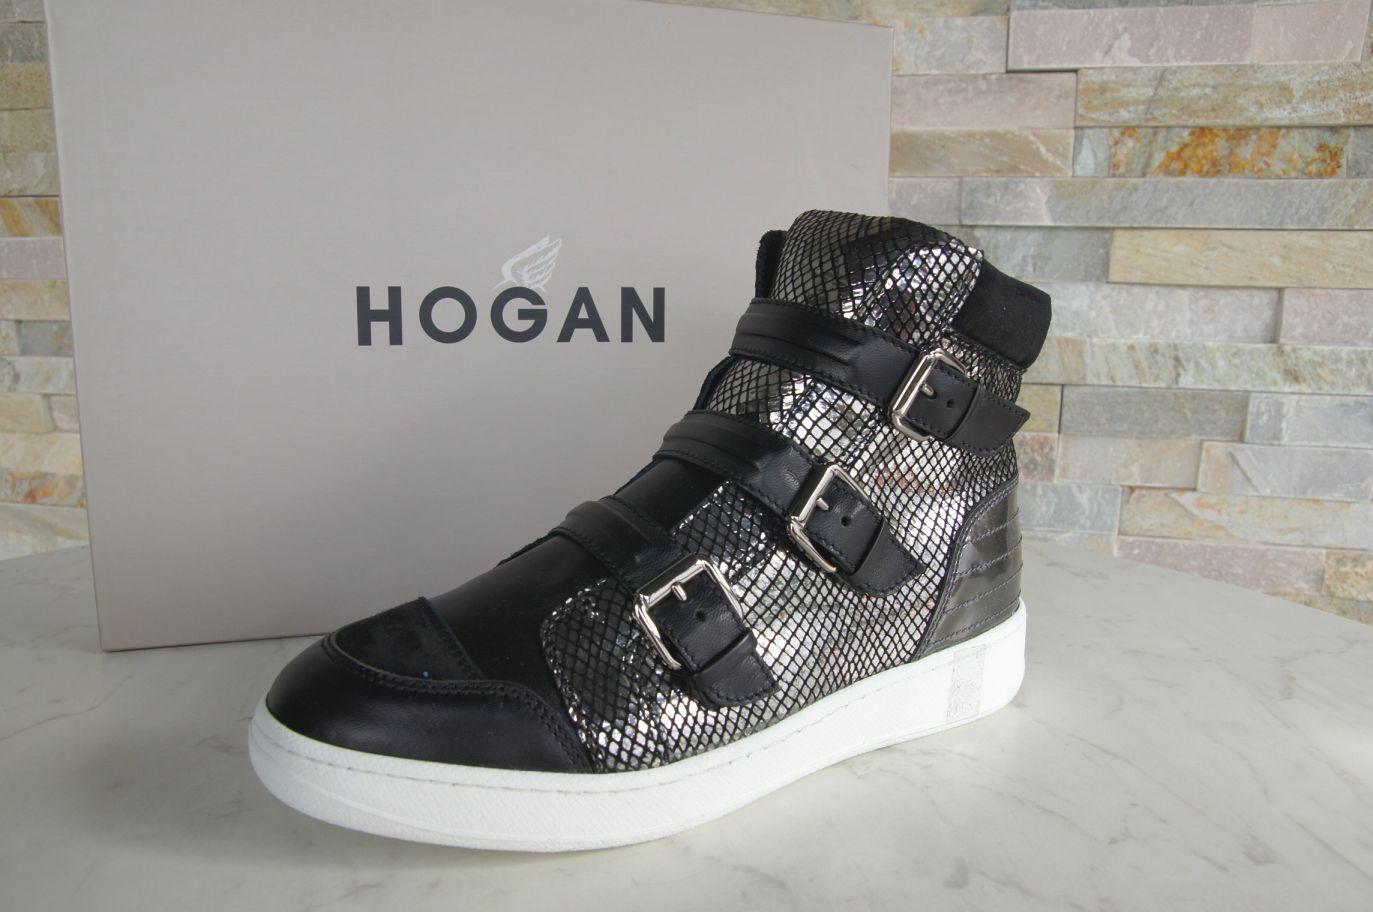 Hogan GR 38,5 High-Top sneakers botines zapatos botitas metal nuevo PVP